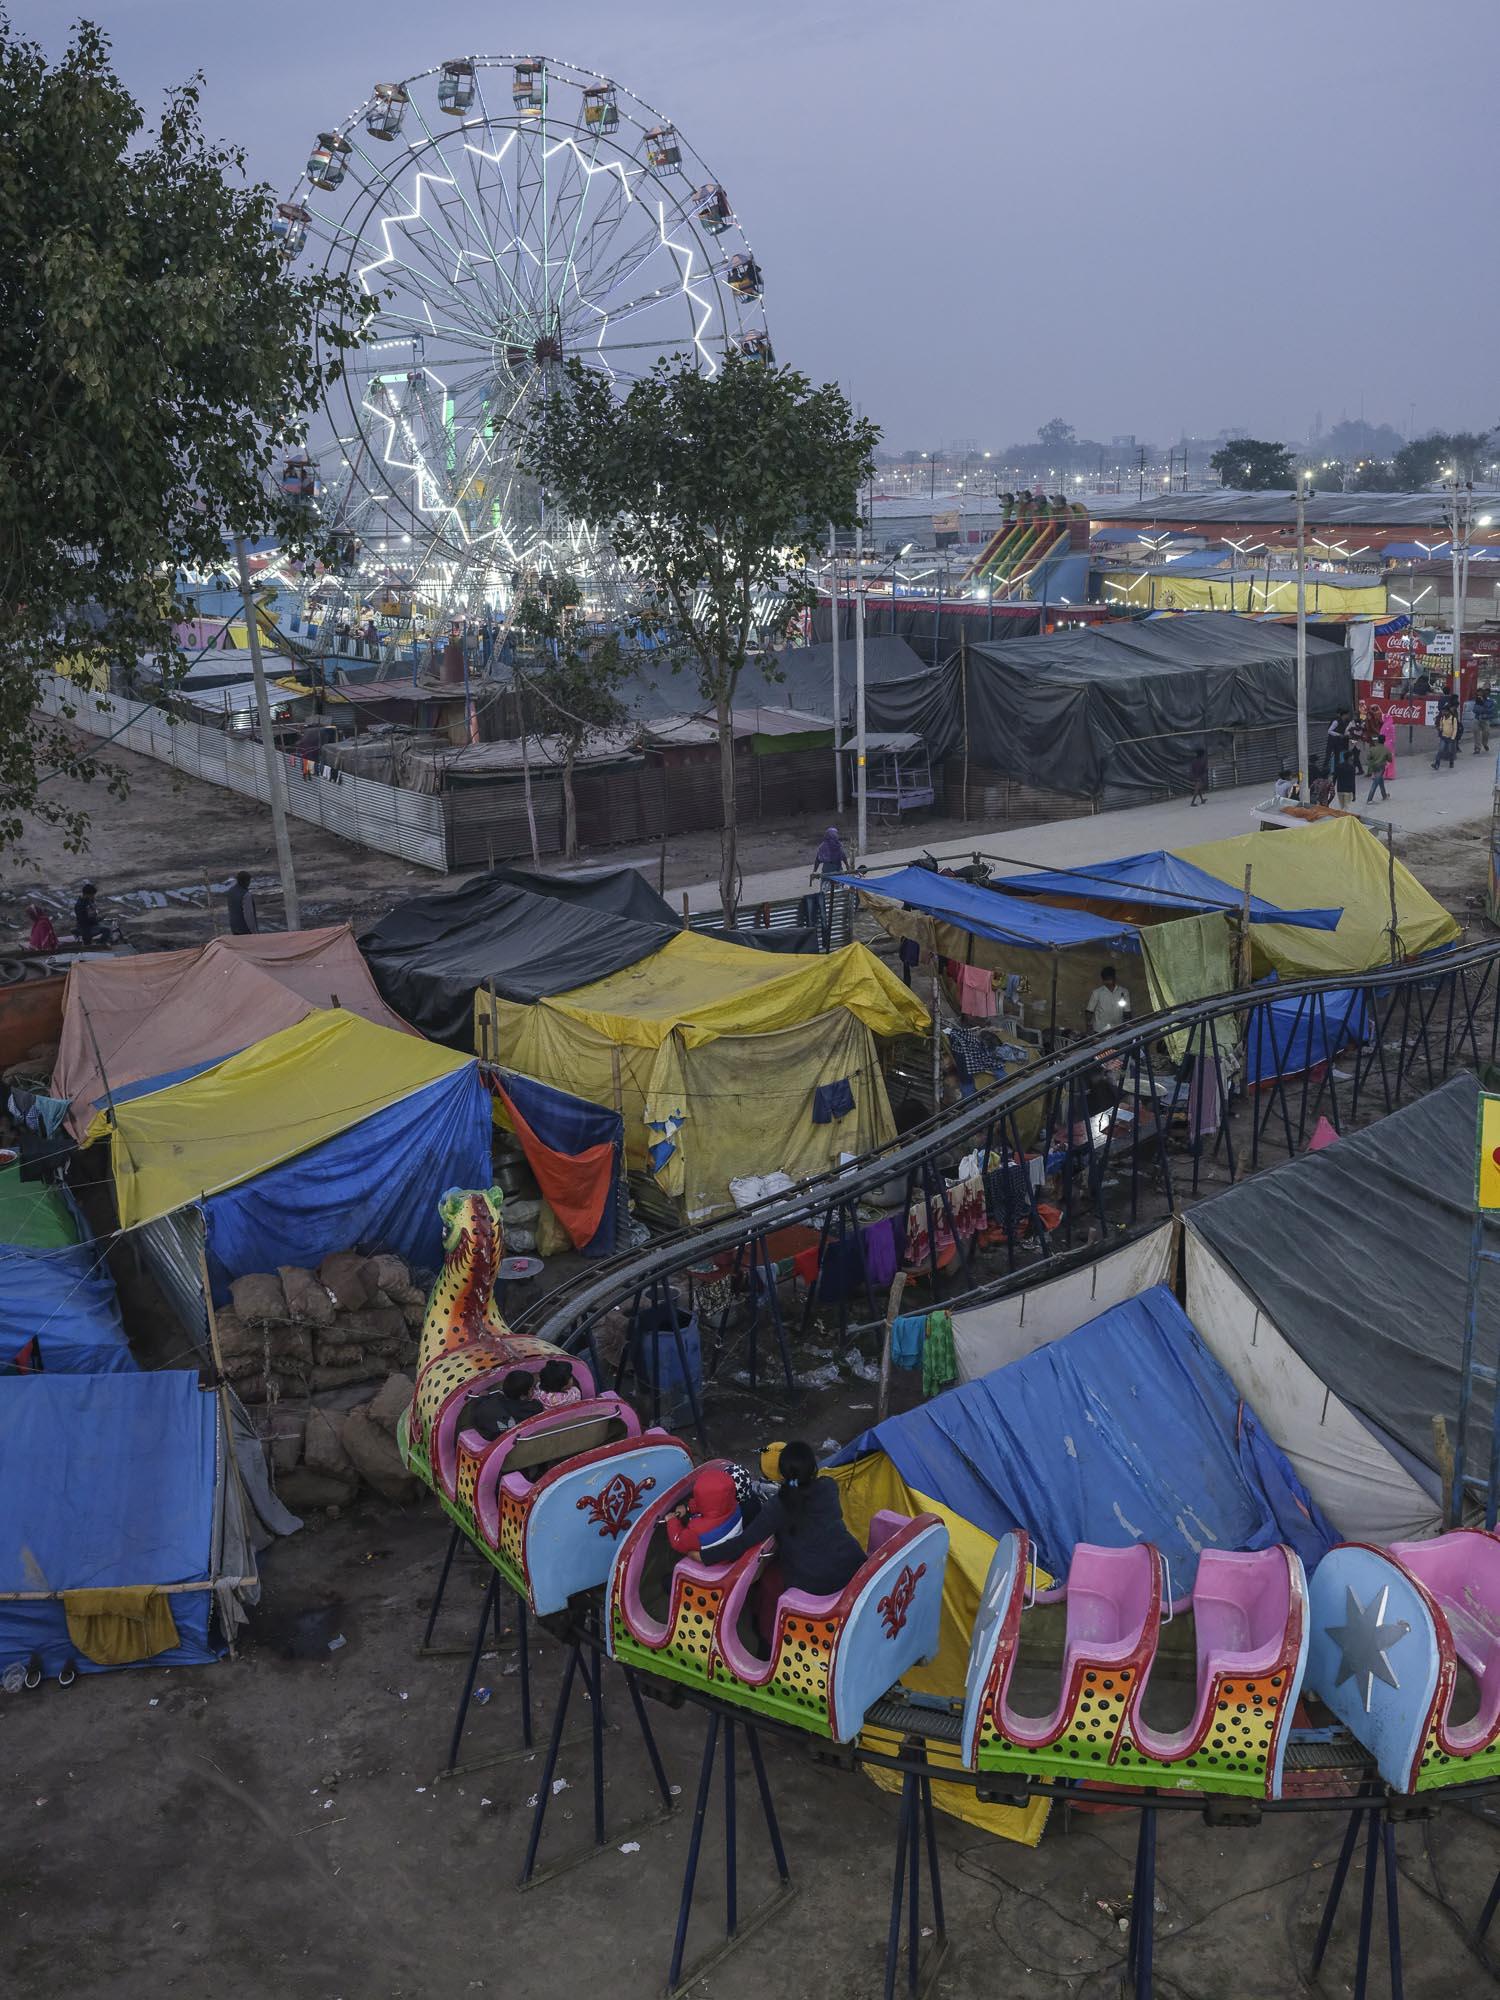 fair party big wheel pilgrims Kumbh mela 2019 India Allahabad Prayagraj Ardh hindu religious Festival event rivers photographer jose jeuland photography